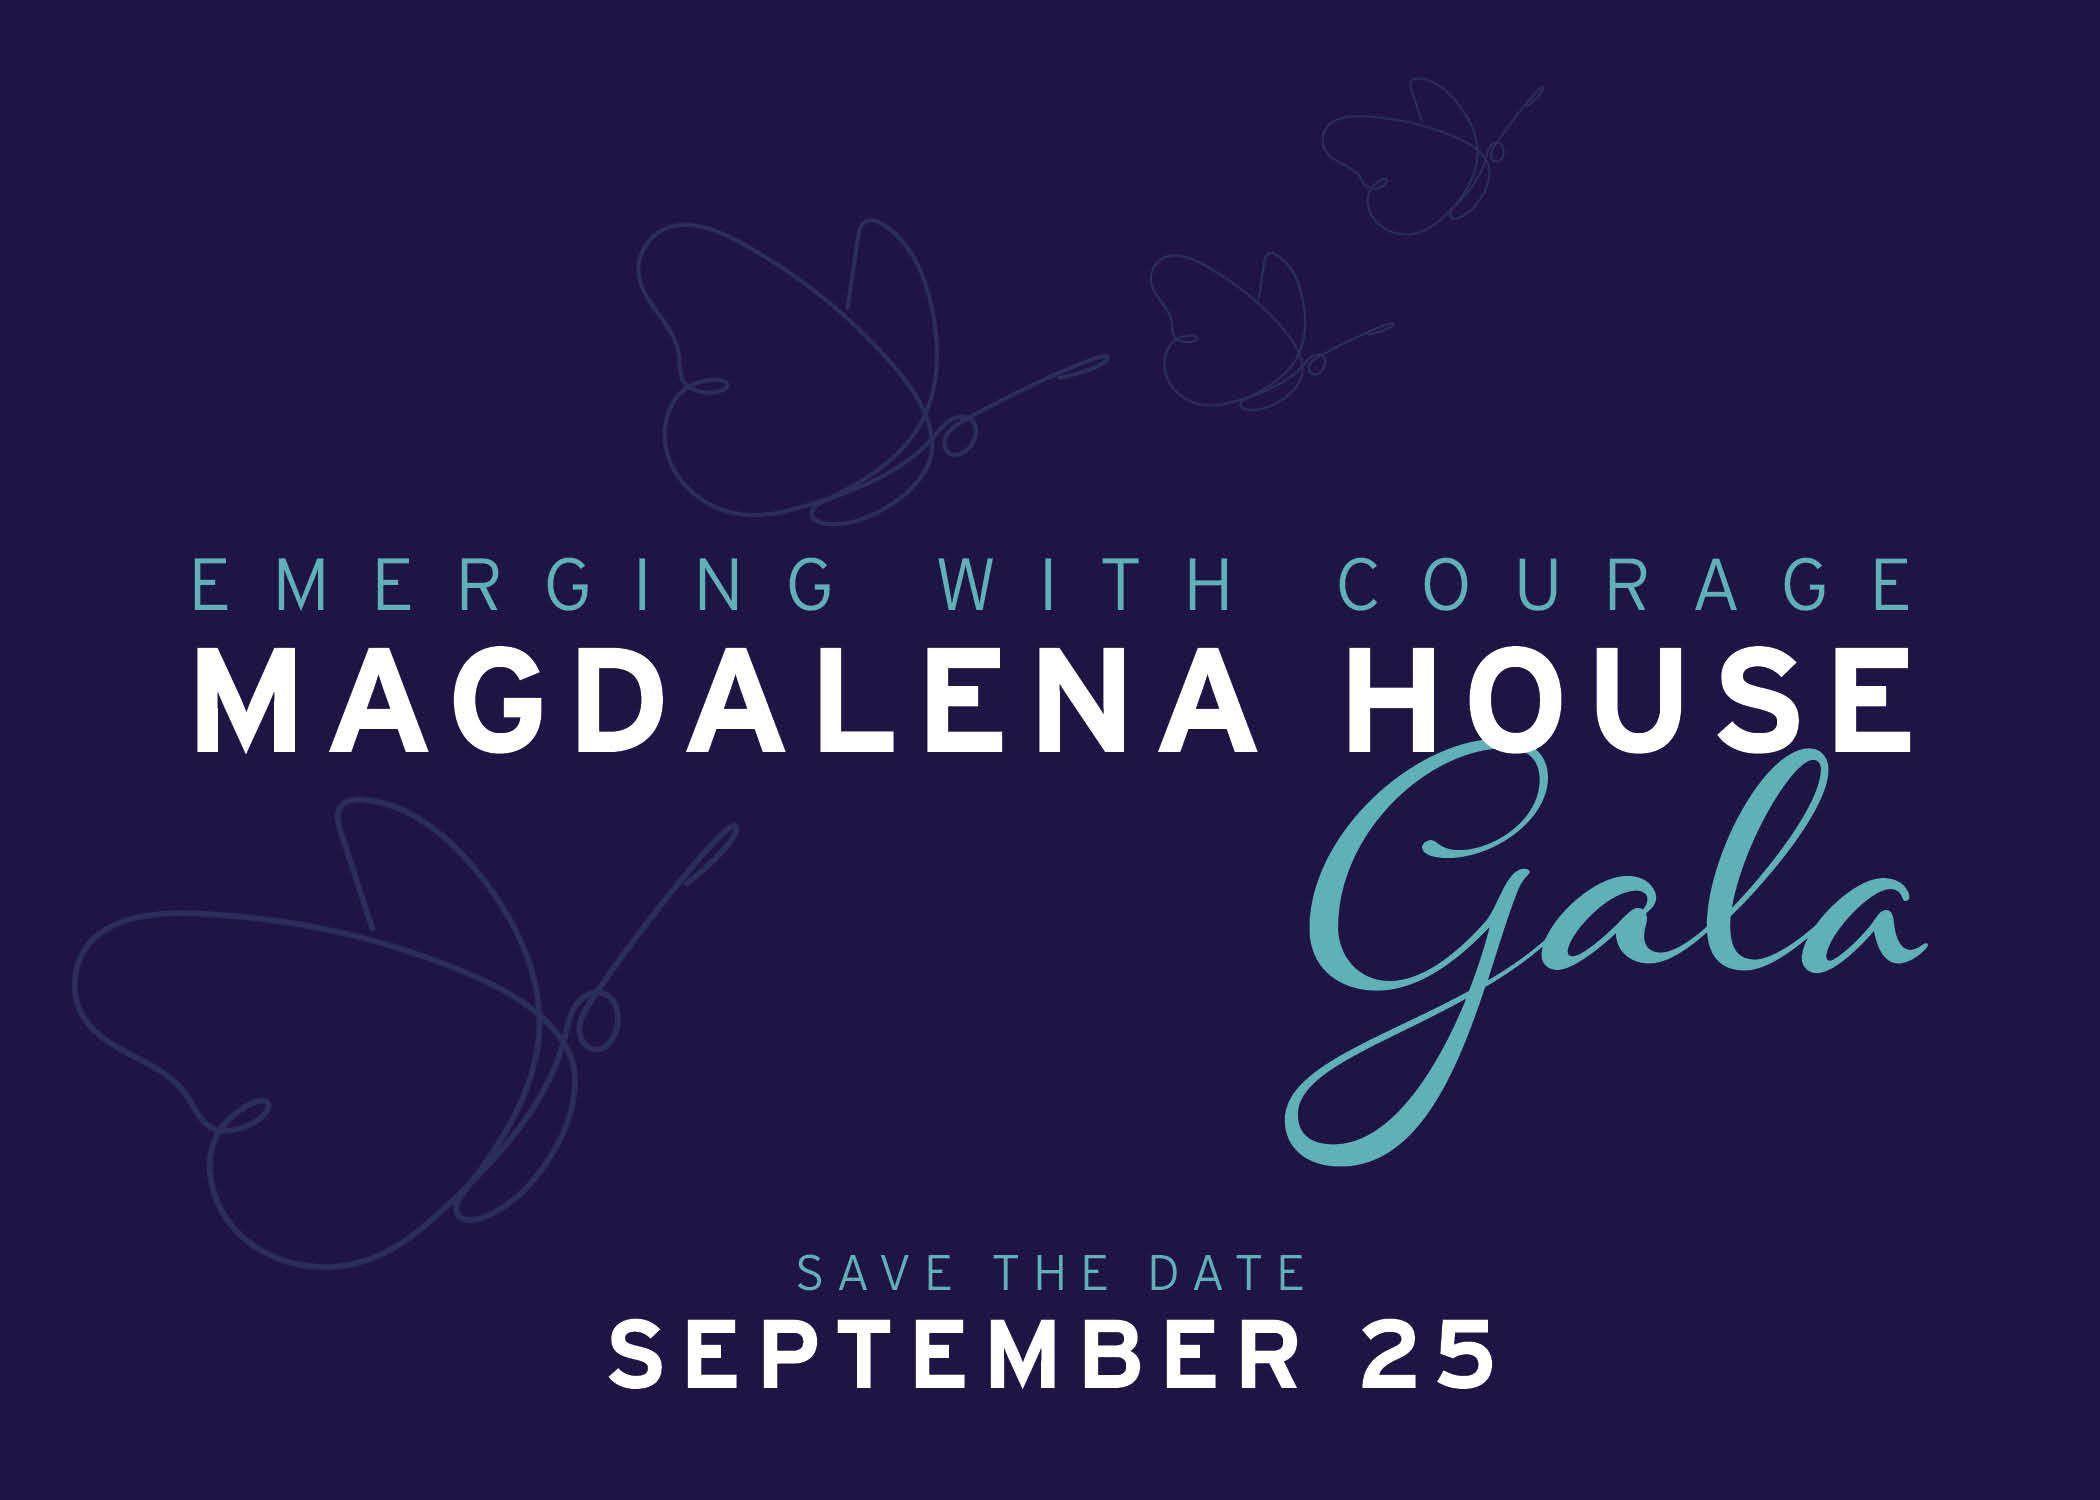 Magdalena House Gala September 25 2021